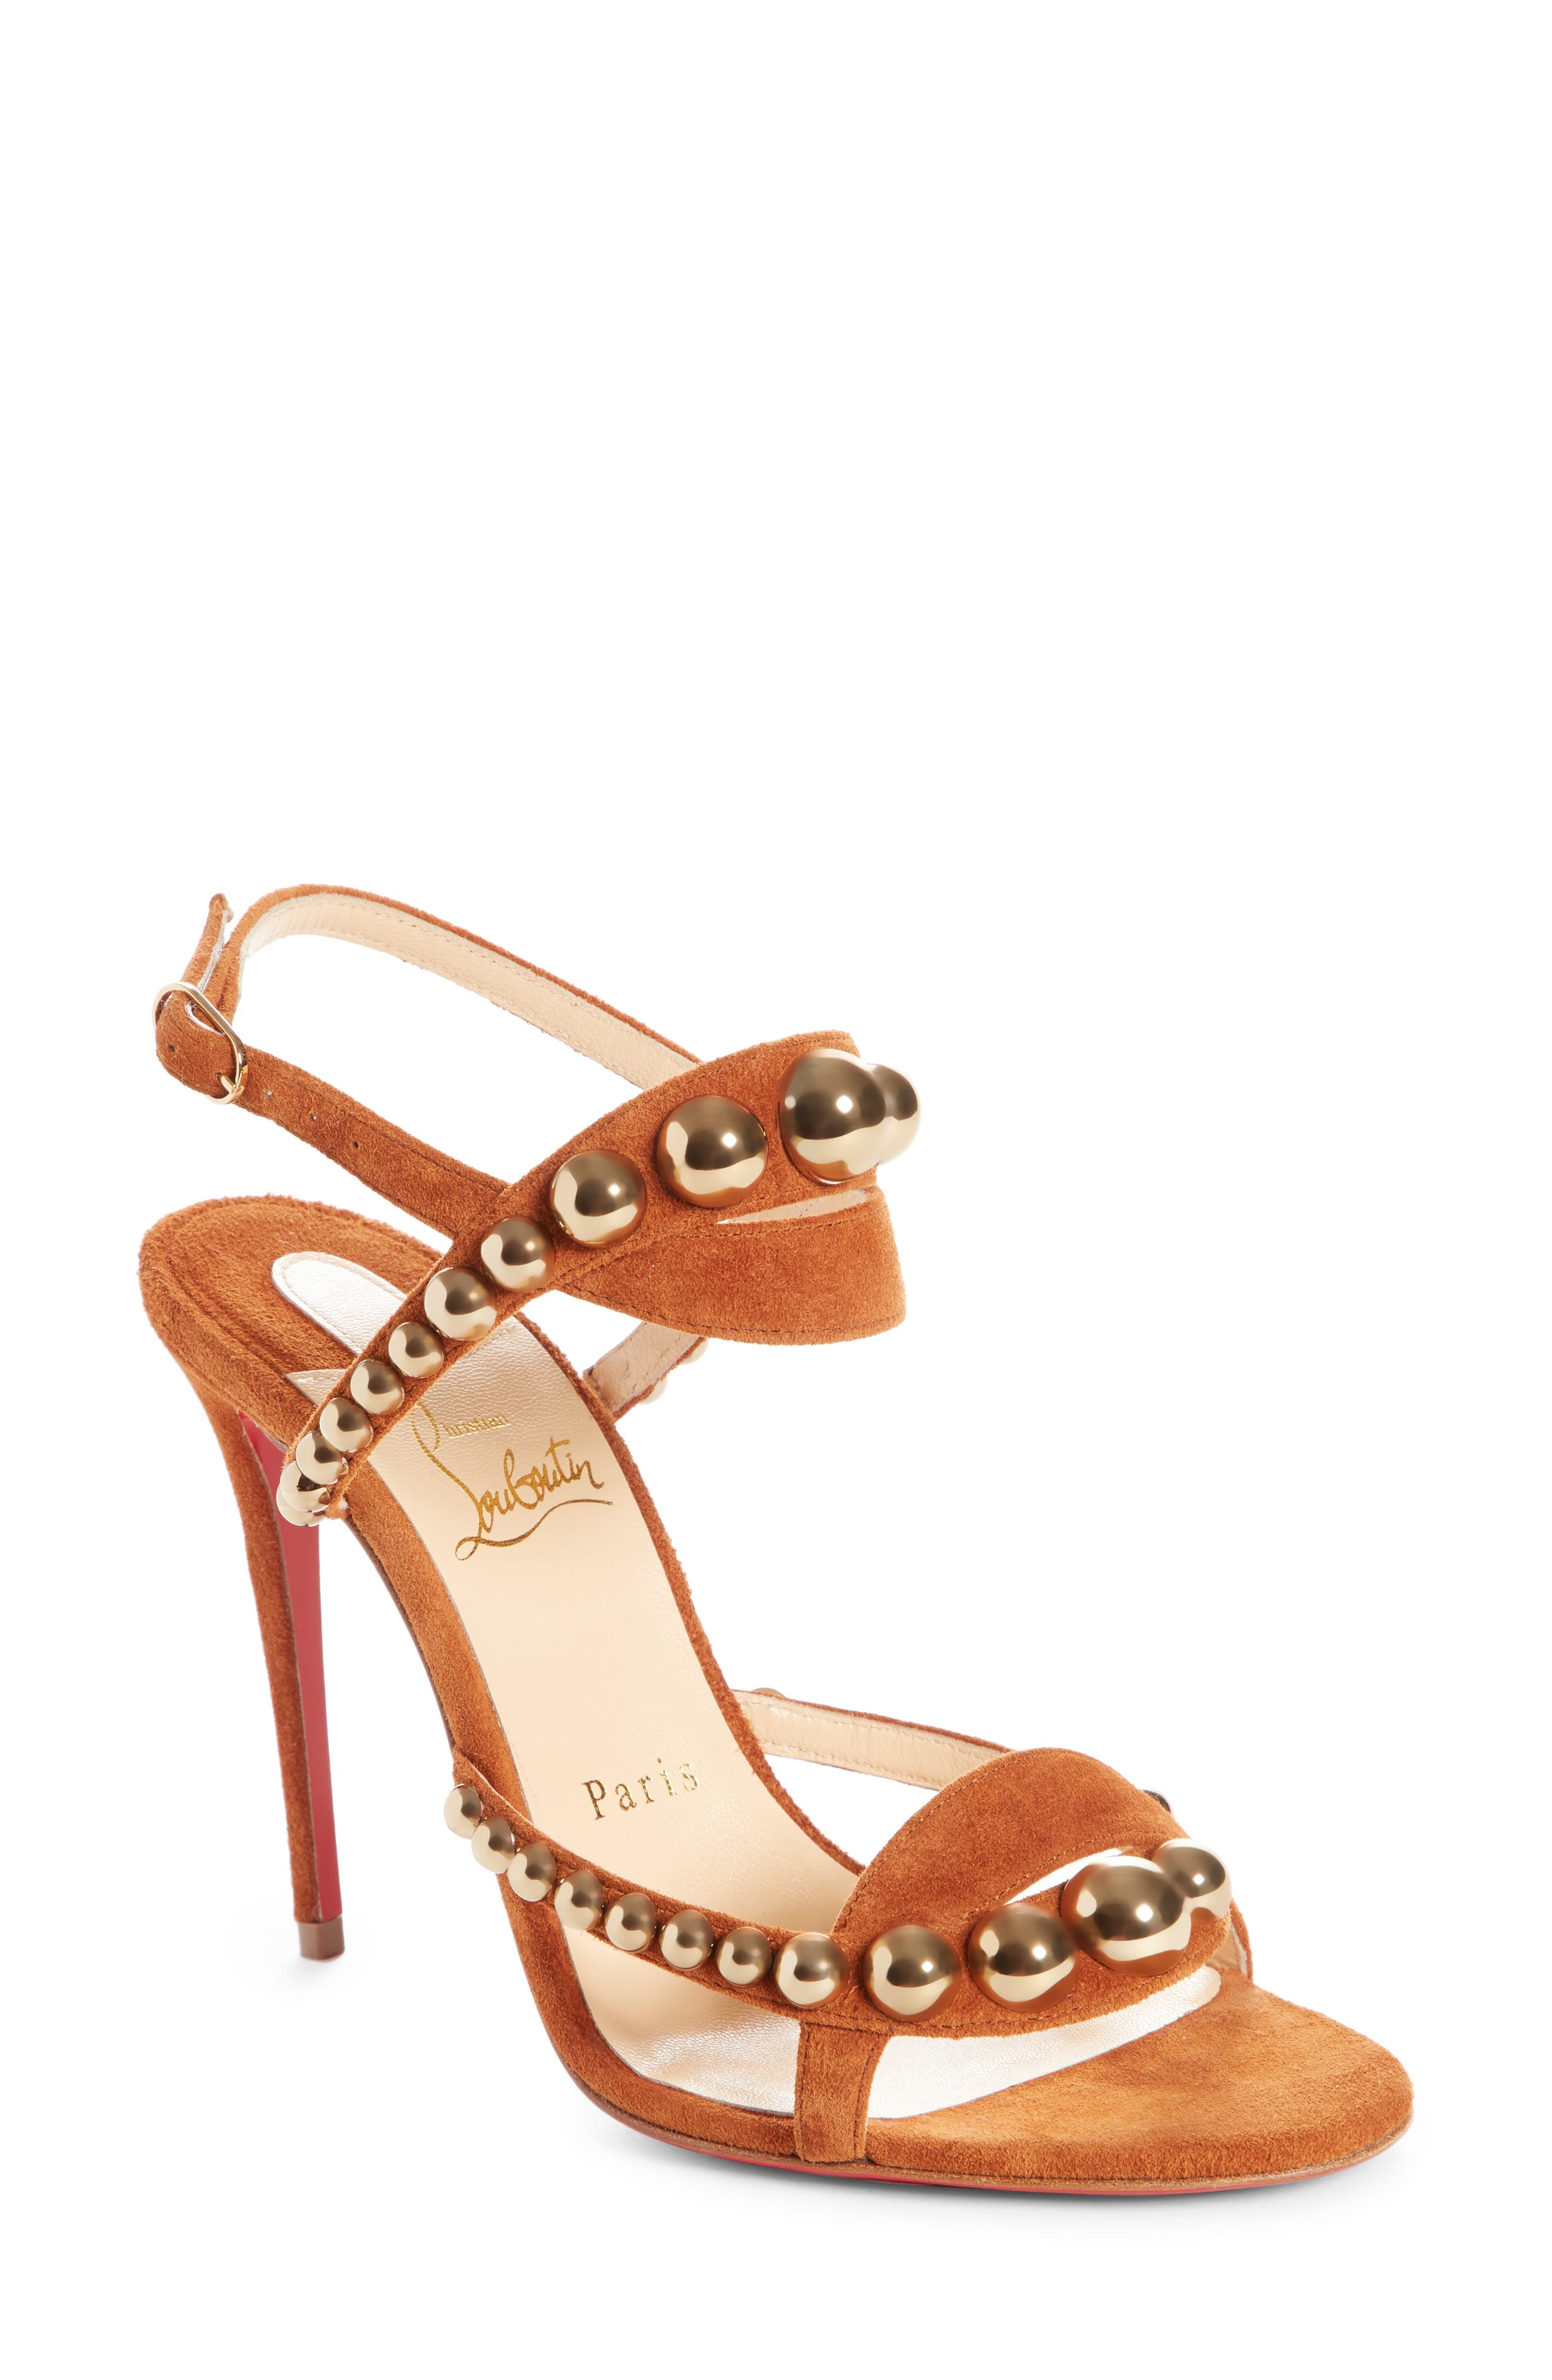 Galeria Ornament Sandal,                         Main,                         color, Cannelle/ Bronze